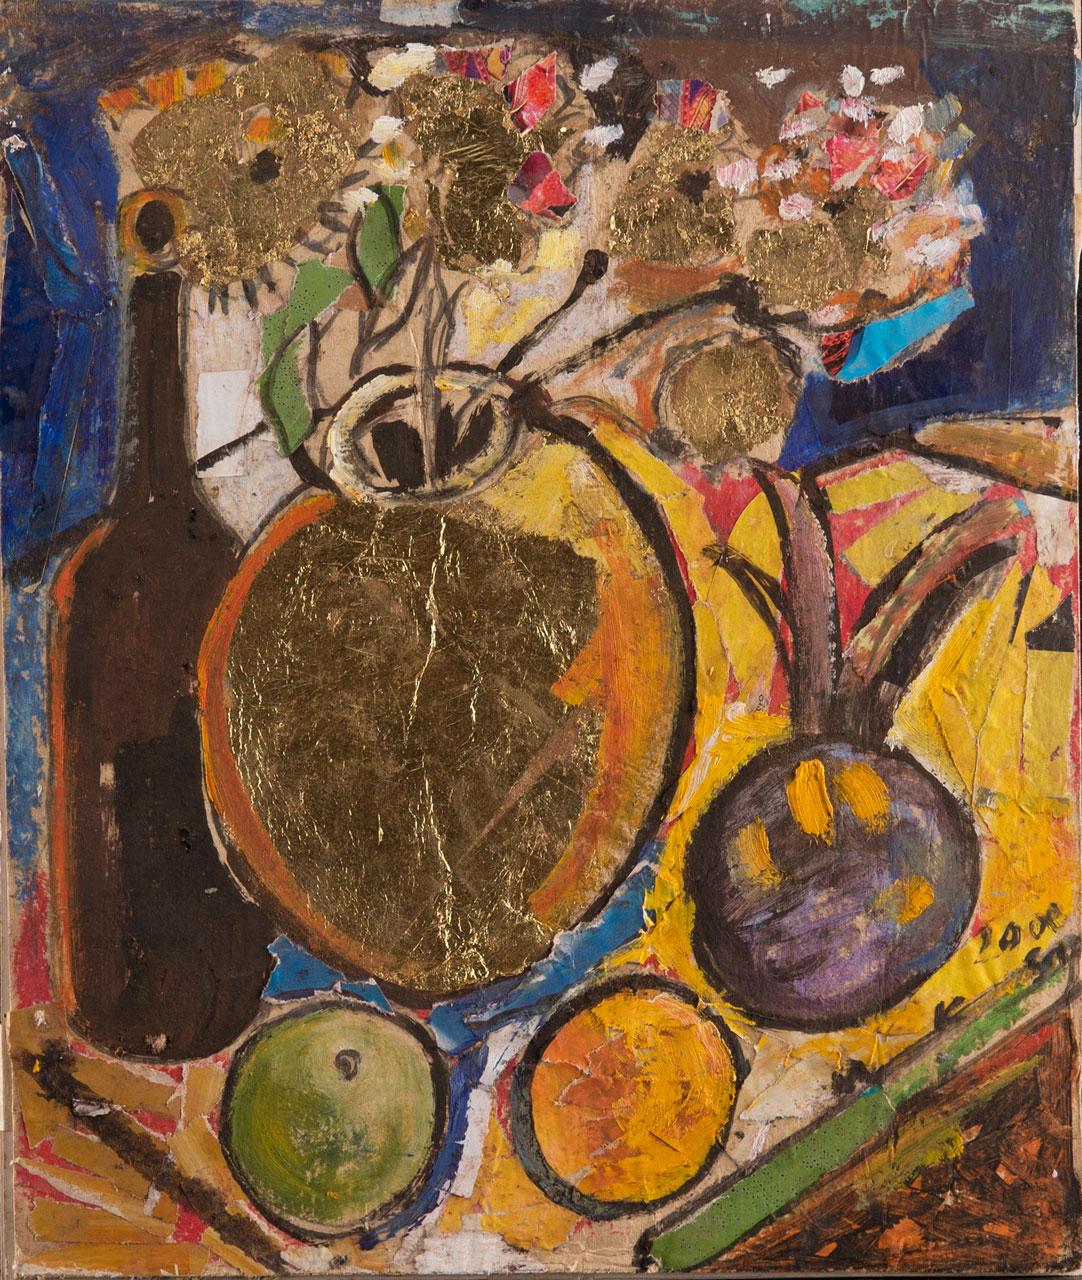 Geoffrey Mukasa (Ugandan, 1954-2009), Still Life , 2000, collage, paint and gold leaf on paper, 30cm x 25cm